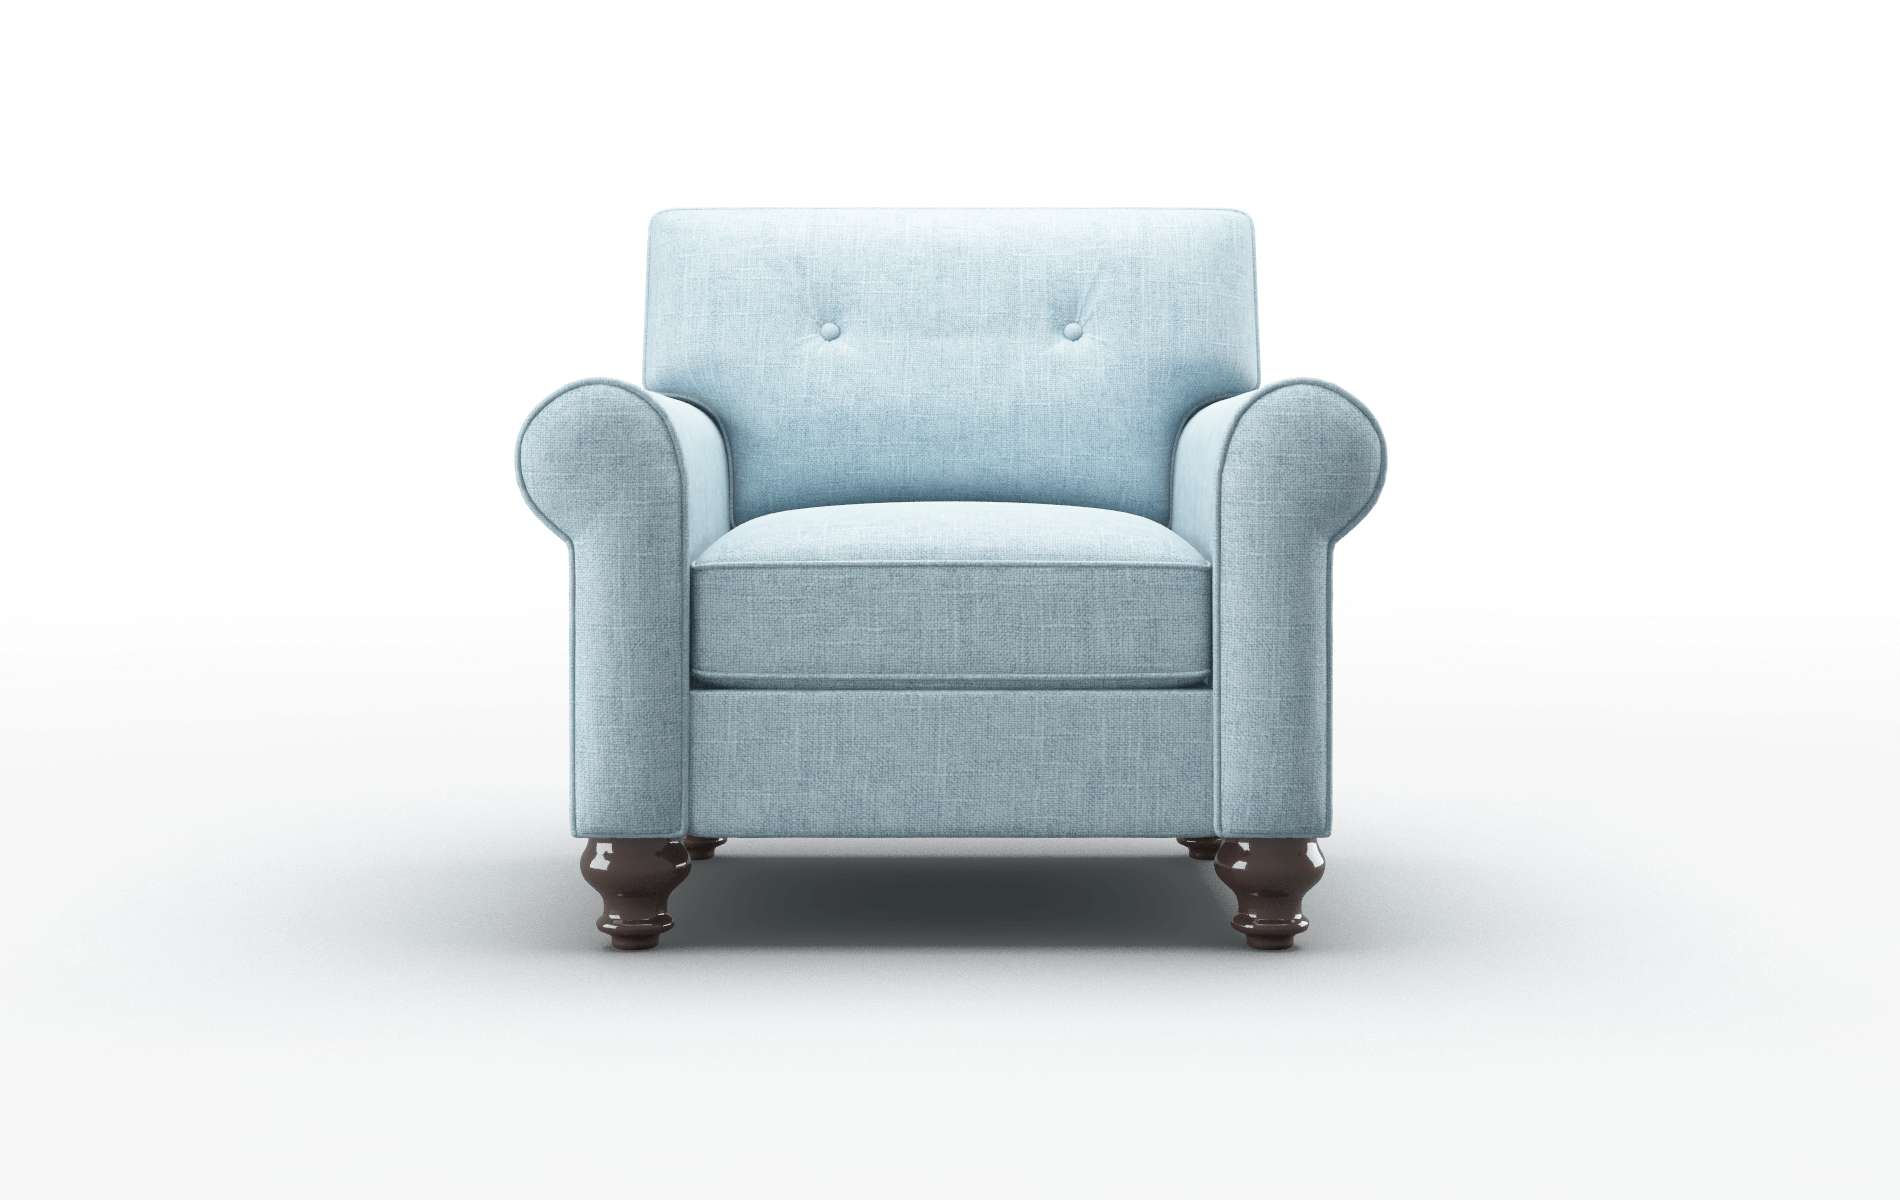 Farah Atlas Turquoise Chair espresso legs 1